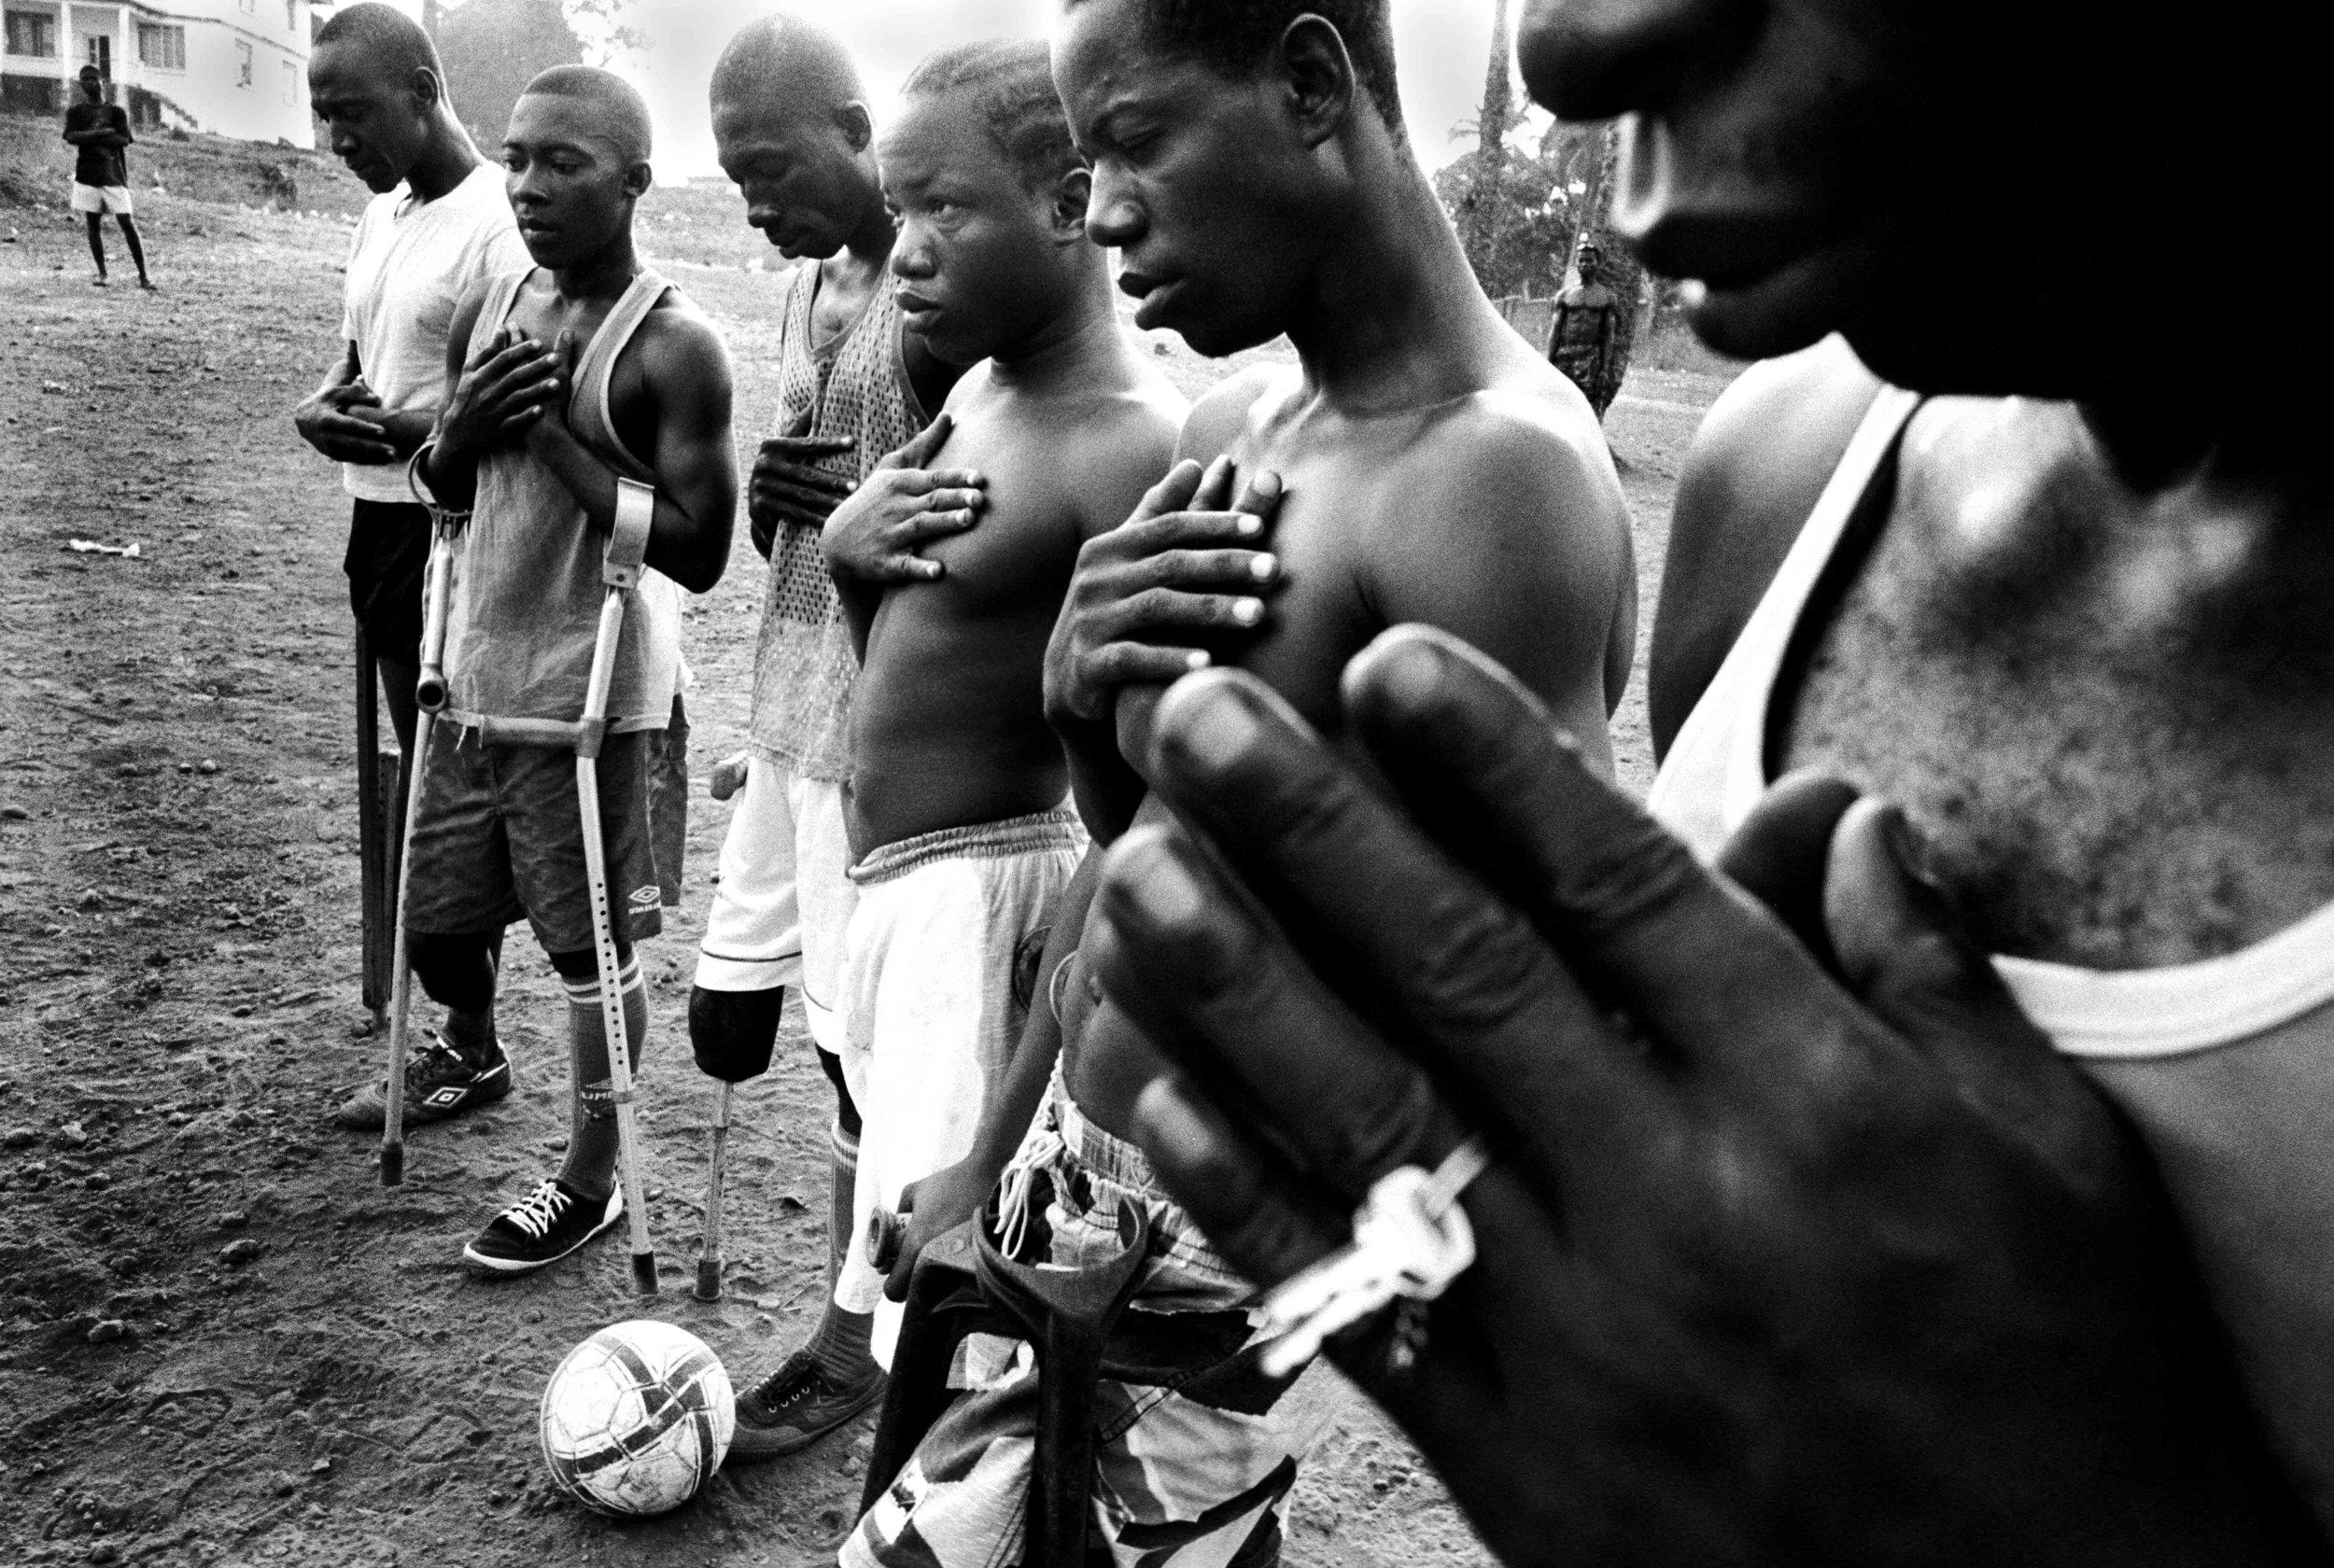 Sierra Leone, Freetown, November 2003, The team praying before the match.